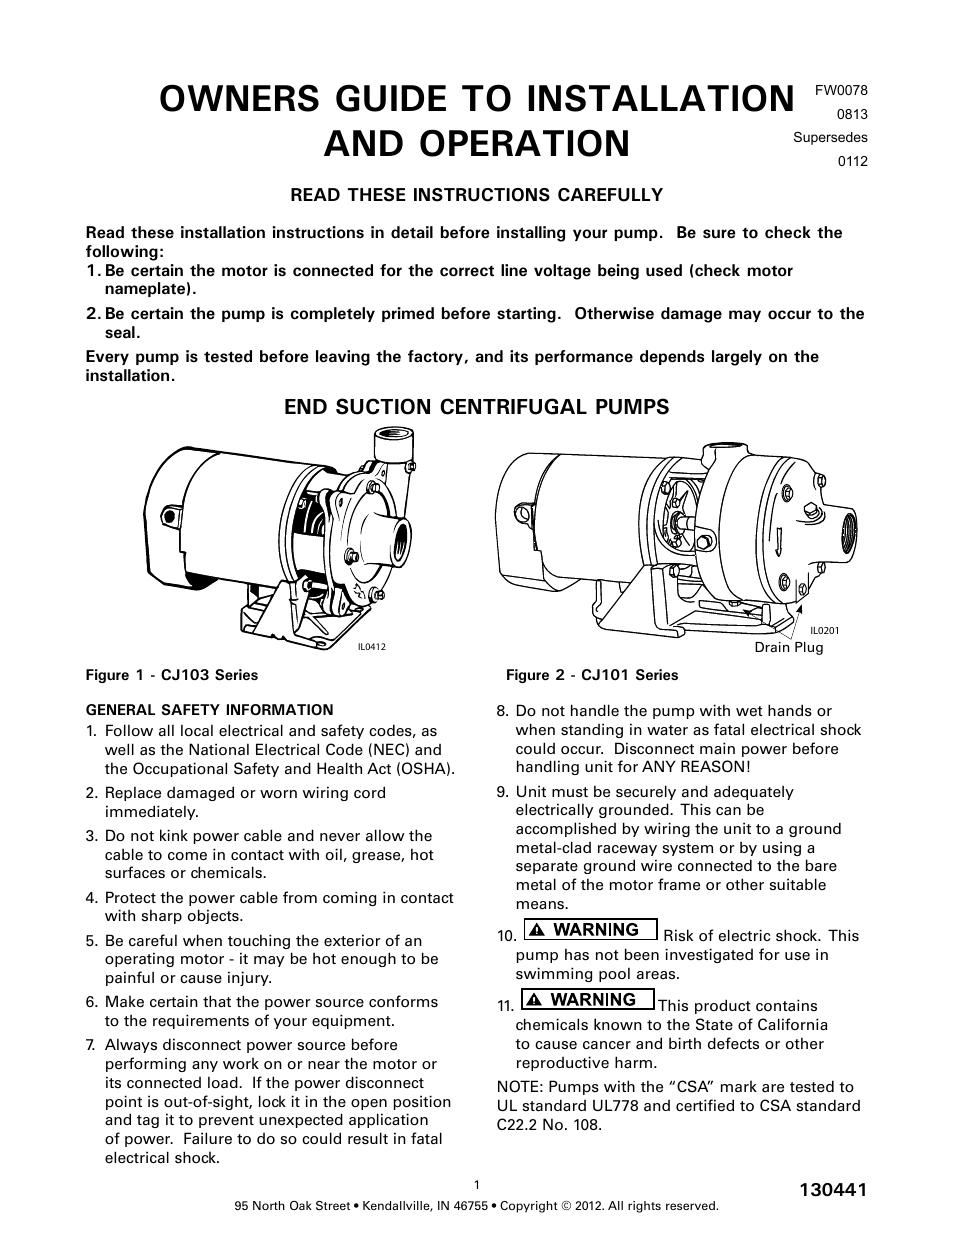 Star Water Systems CJ101 (Flint & Walling) User Manual | 21